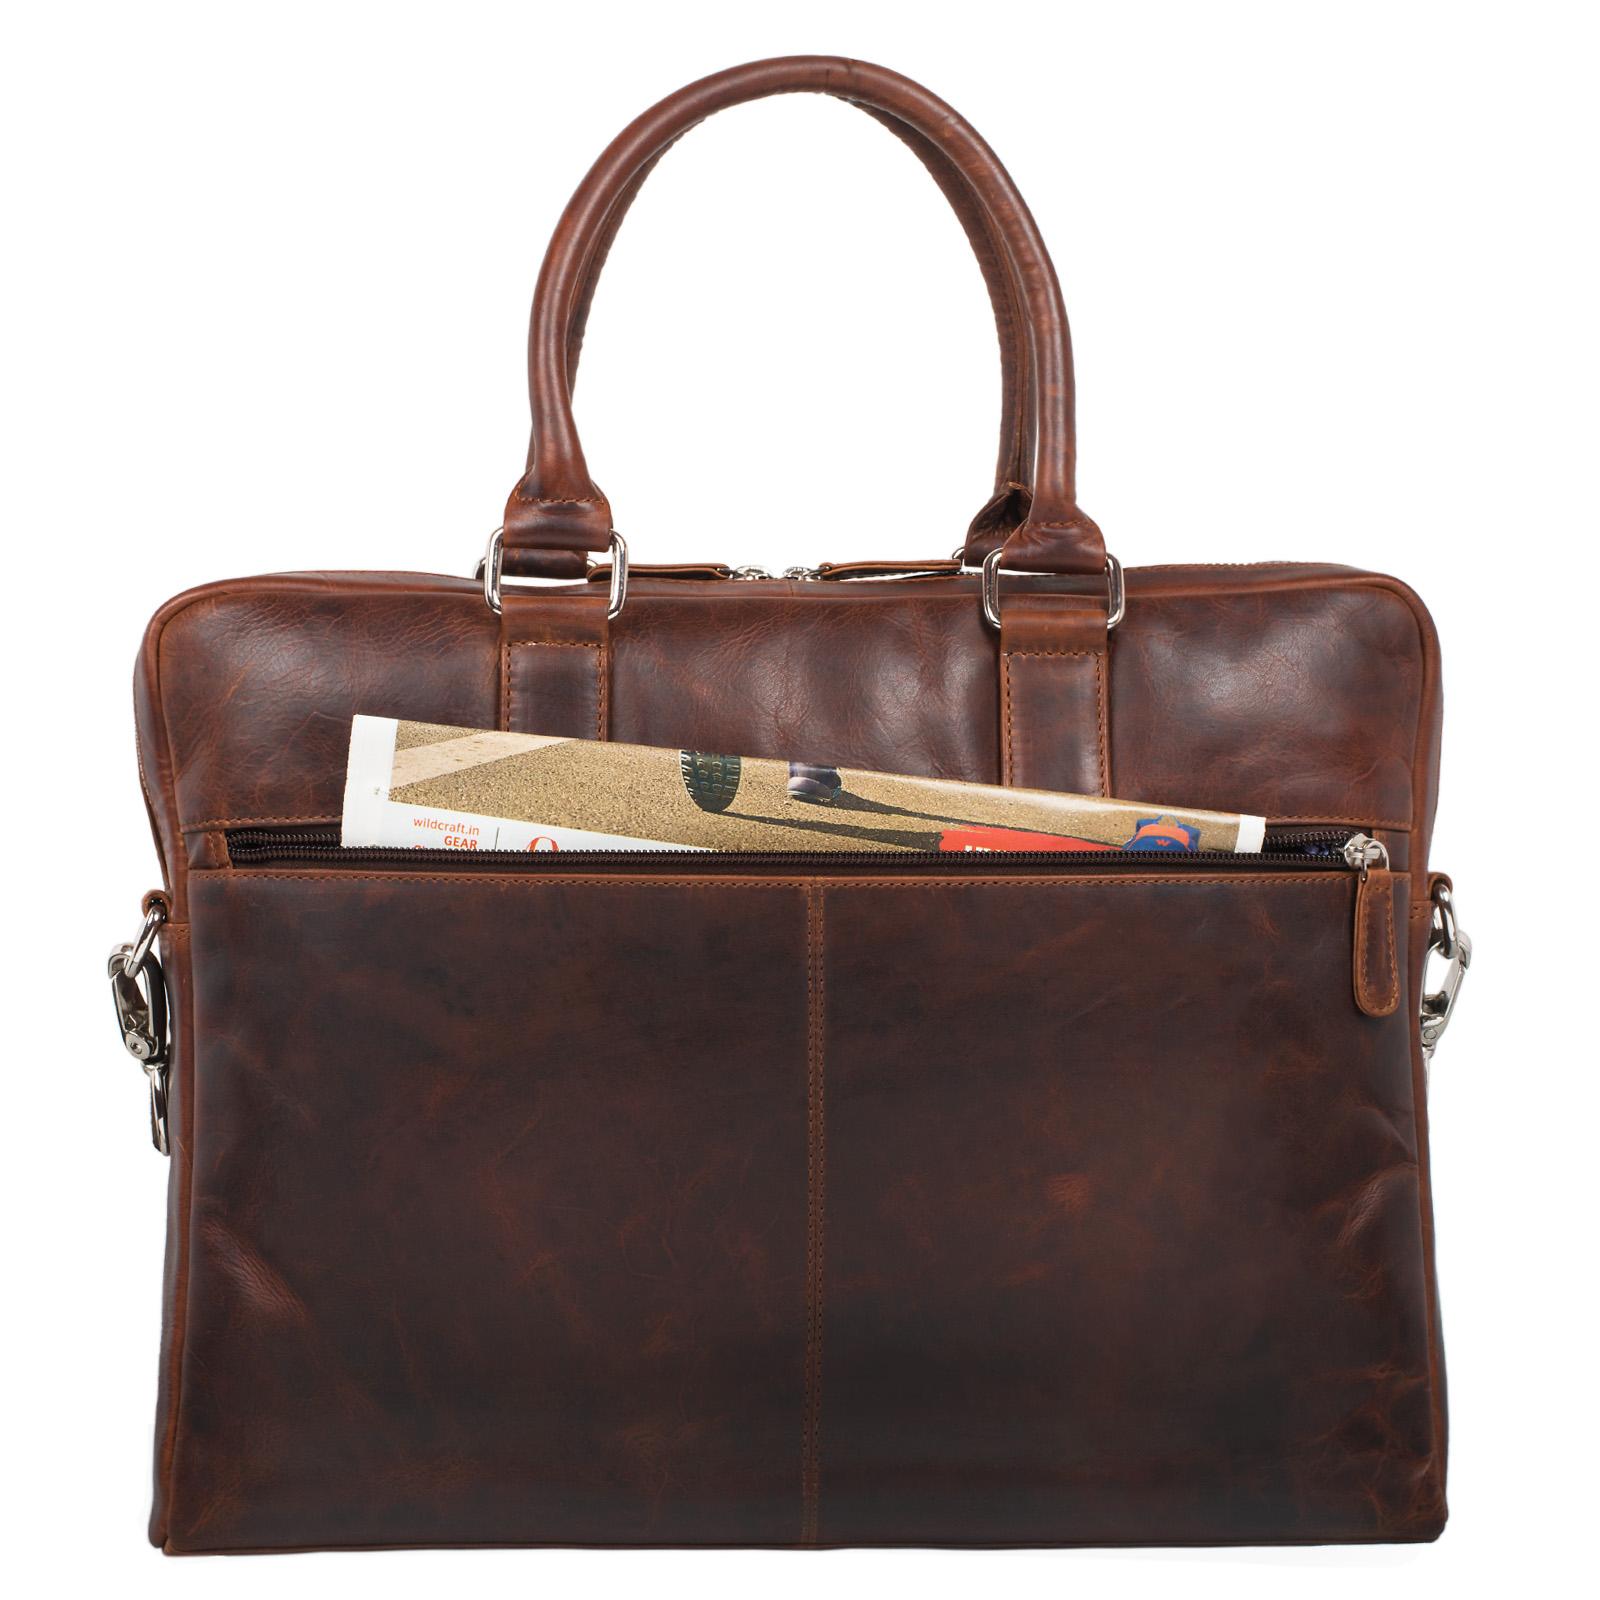 Handtasche Herren Damen Business elegant schwarz Leder